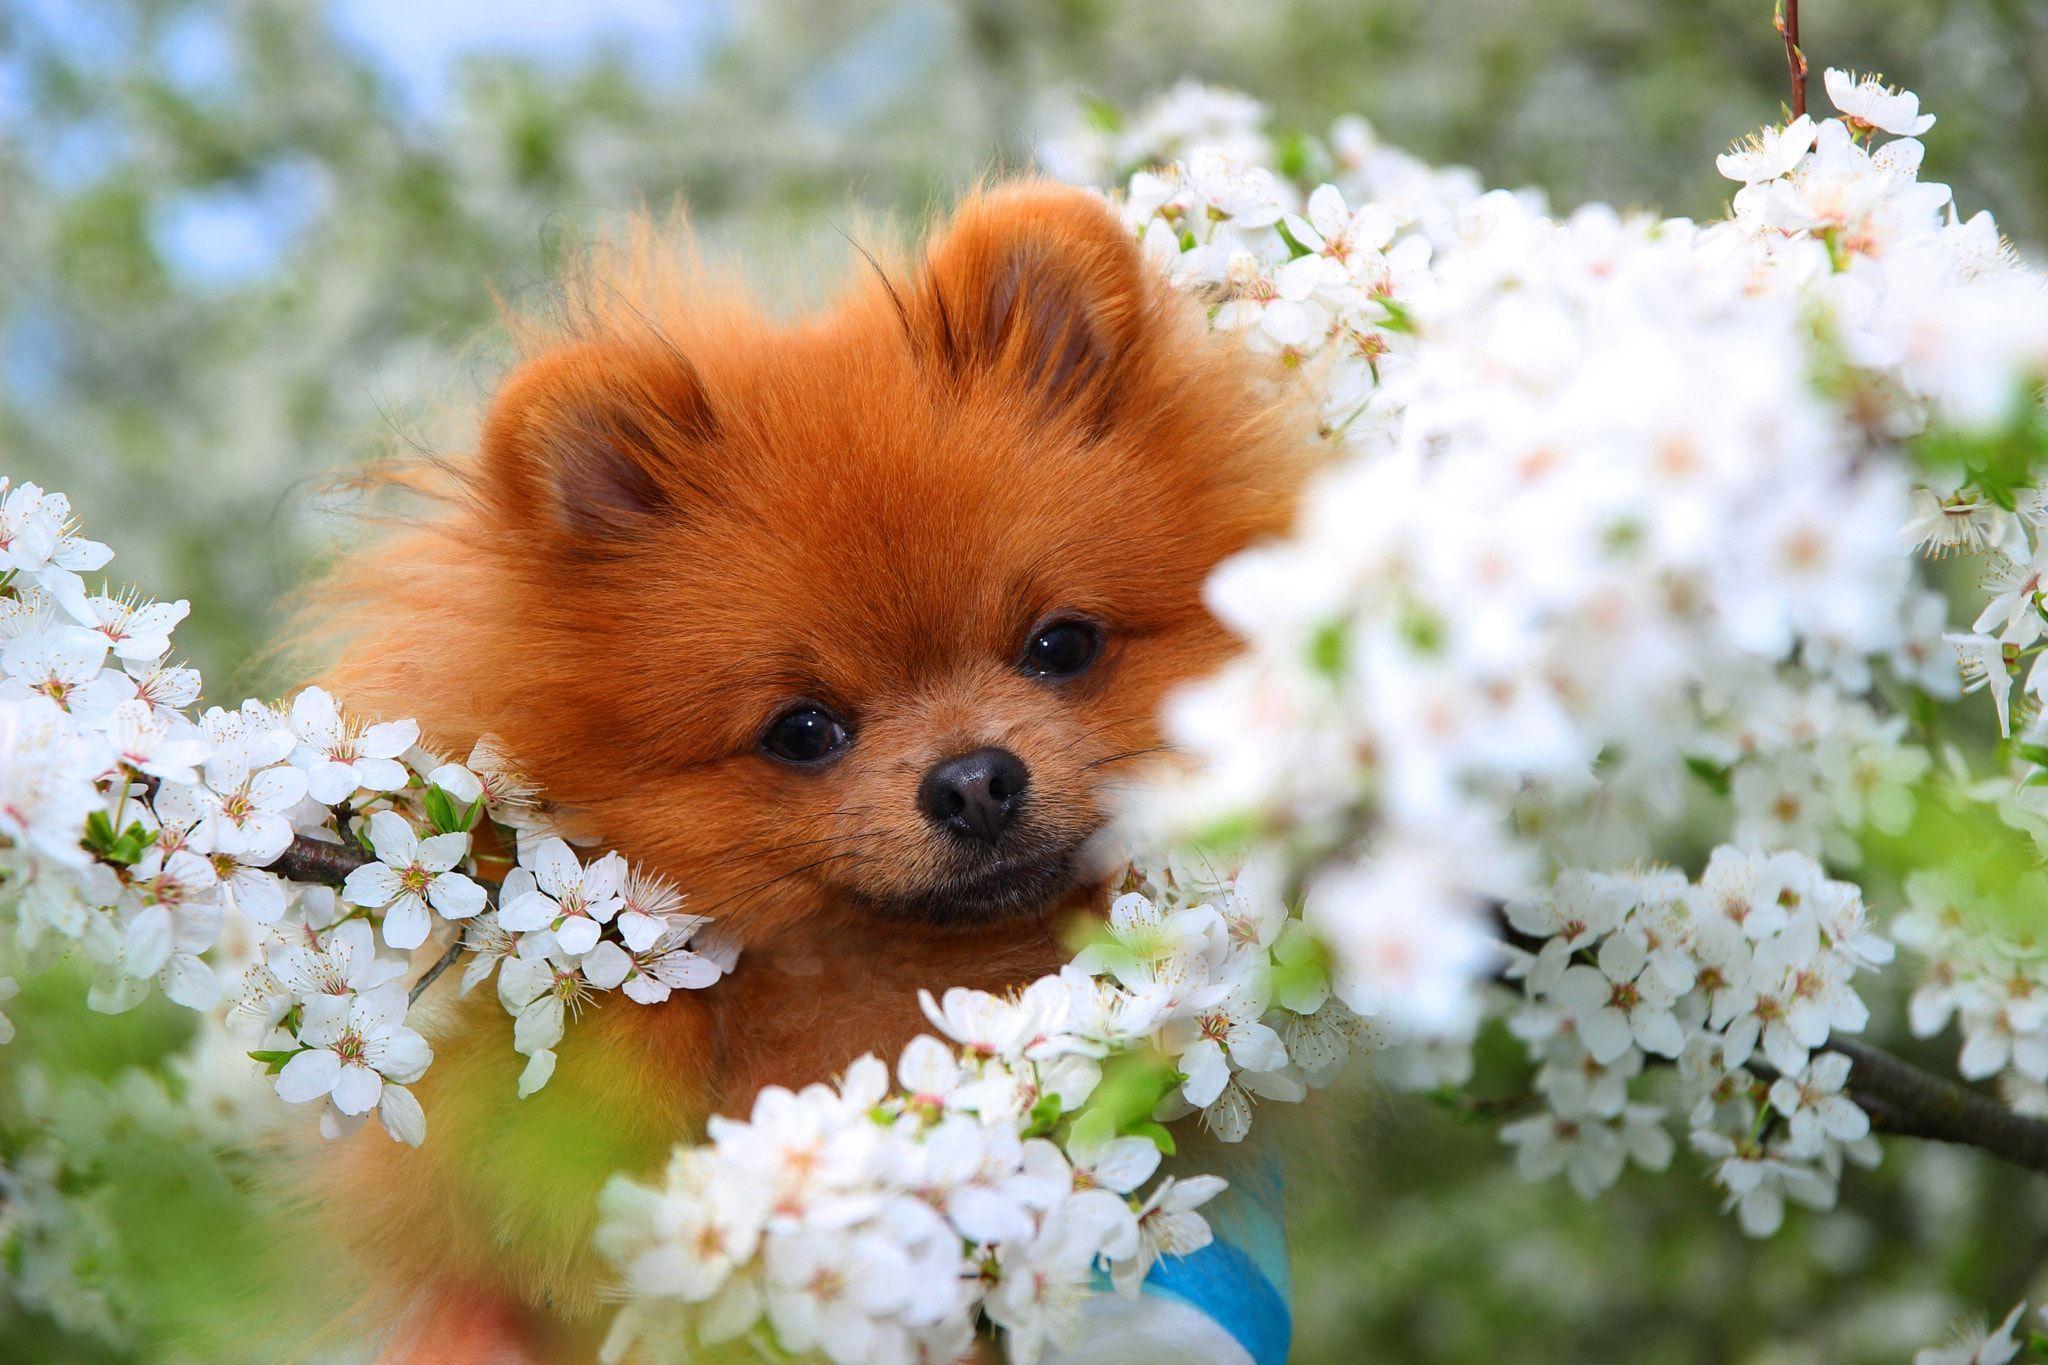 IMG_7982.JPG - Pomeranian dog in spring blossom